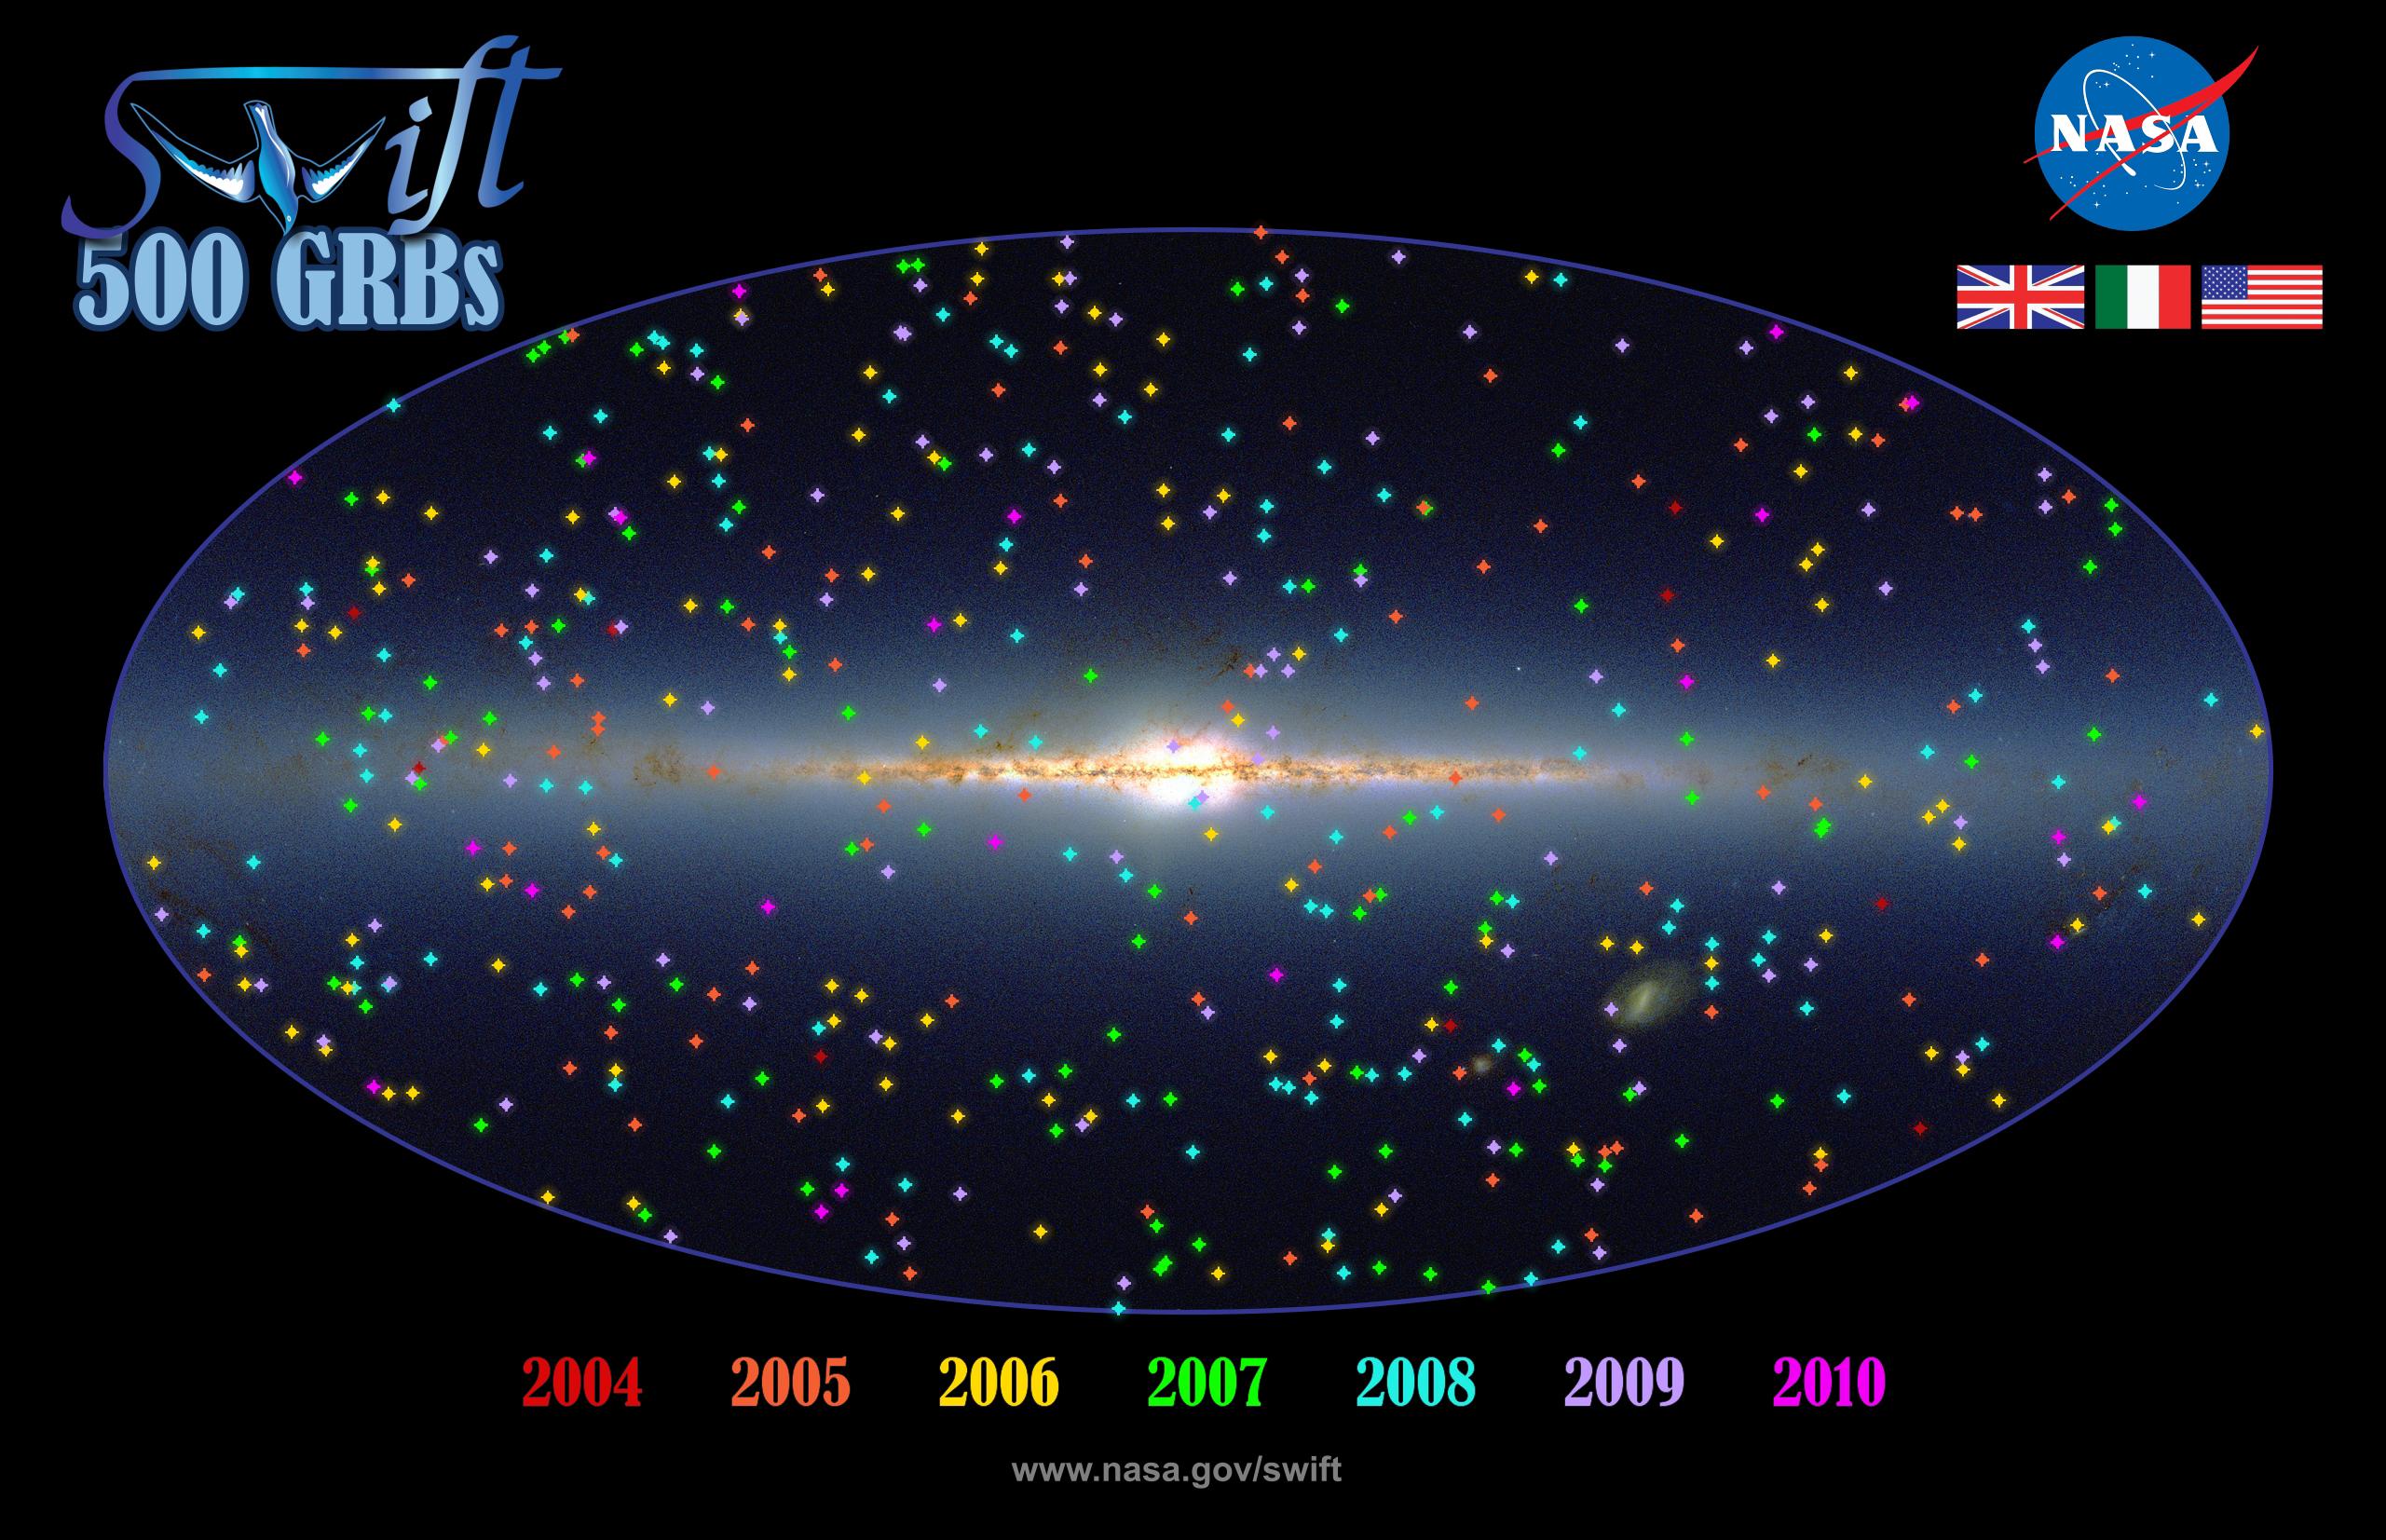 nasa galaxy chart - photo #26